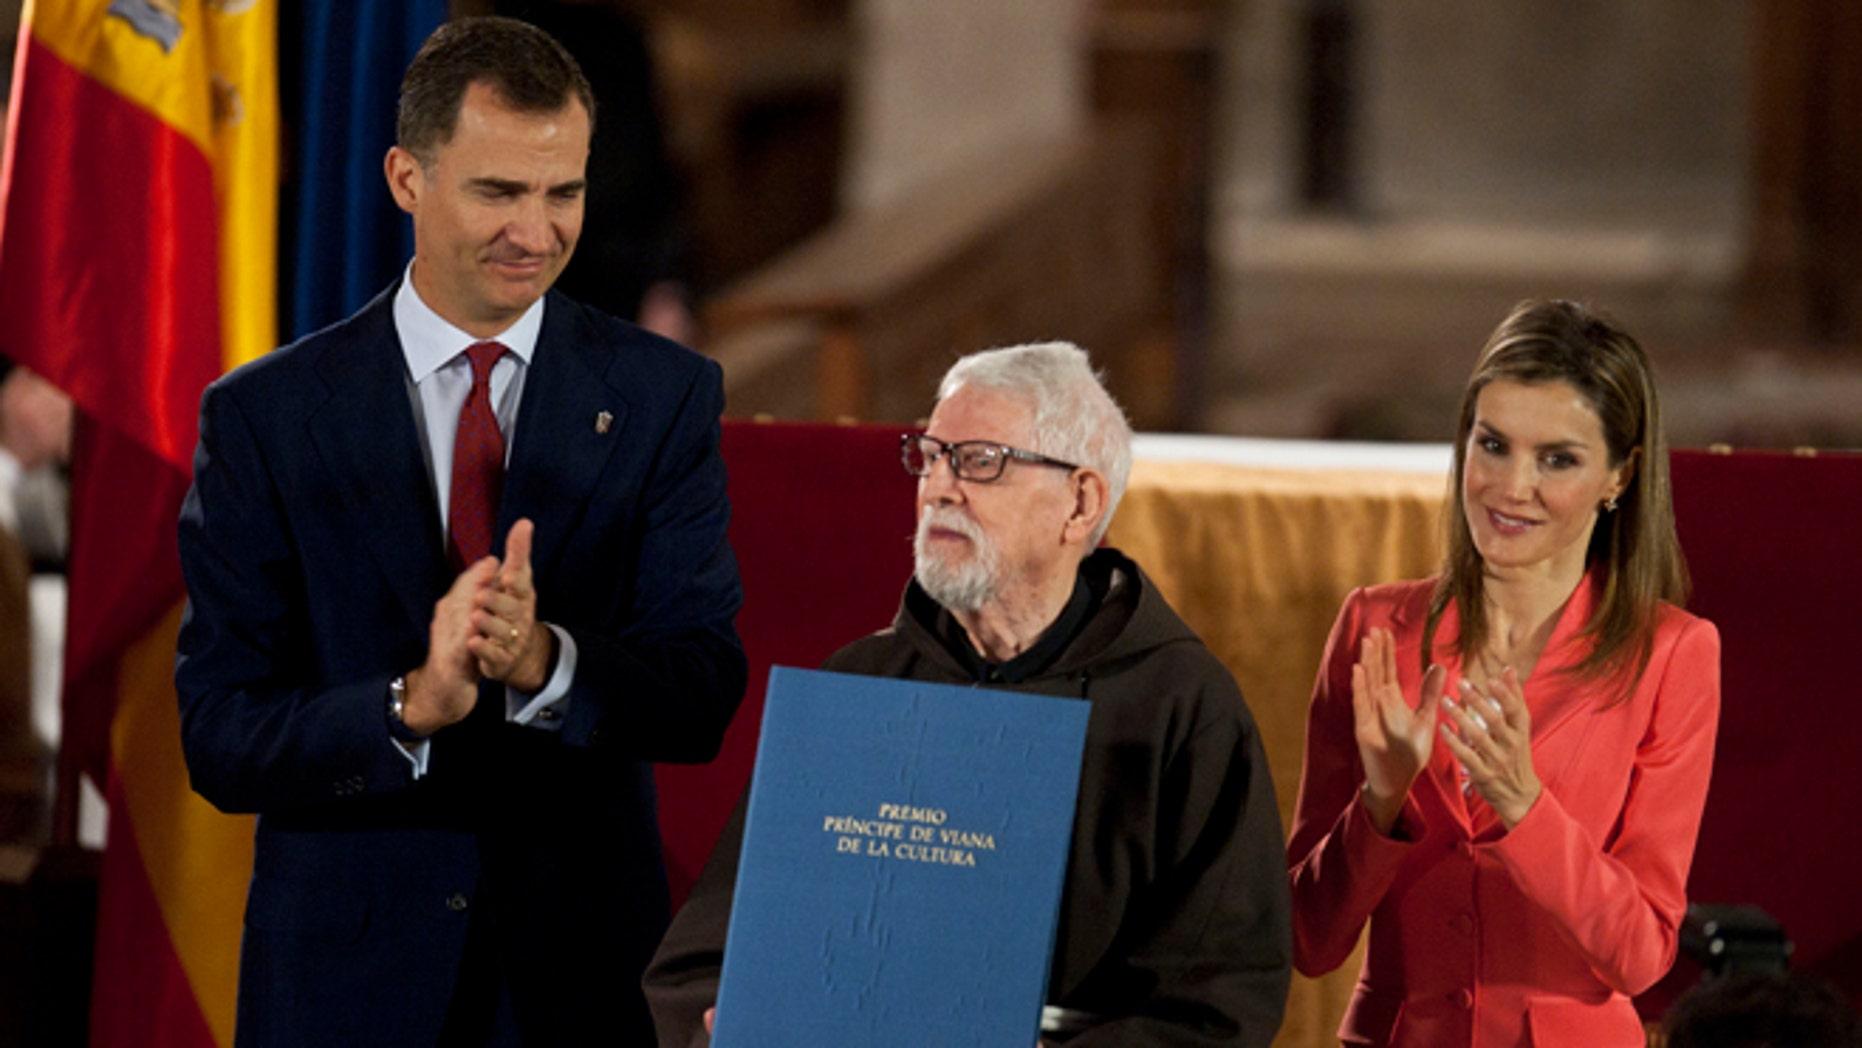 June 4, 2014: Historian Capuchino,Tarsicio de Azcona, center, receives the Prince's Viana Award, from Spain's Prince Felipe at the Monastery of Leyre, 40 miles from Pamplona, northern Spain. (AP)